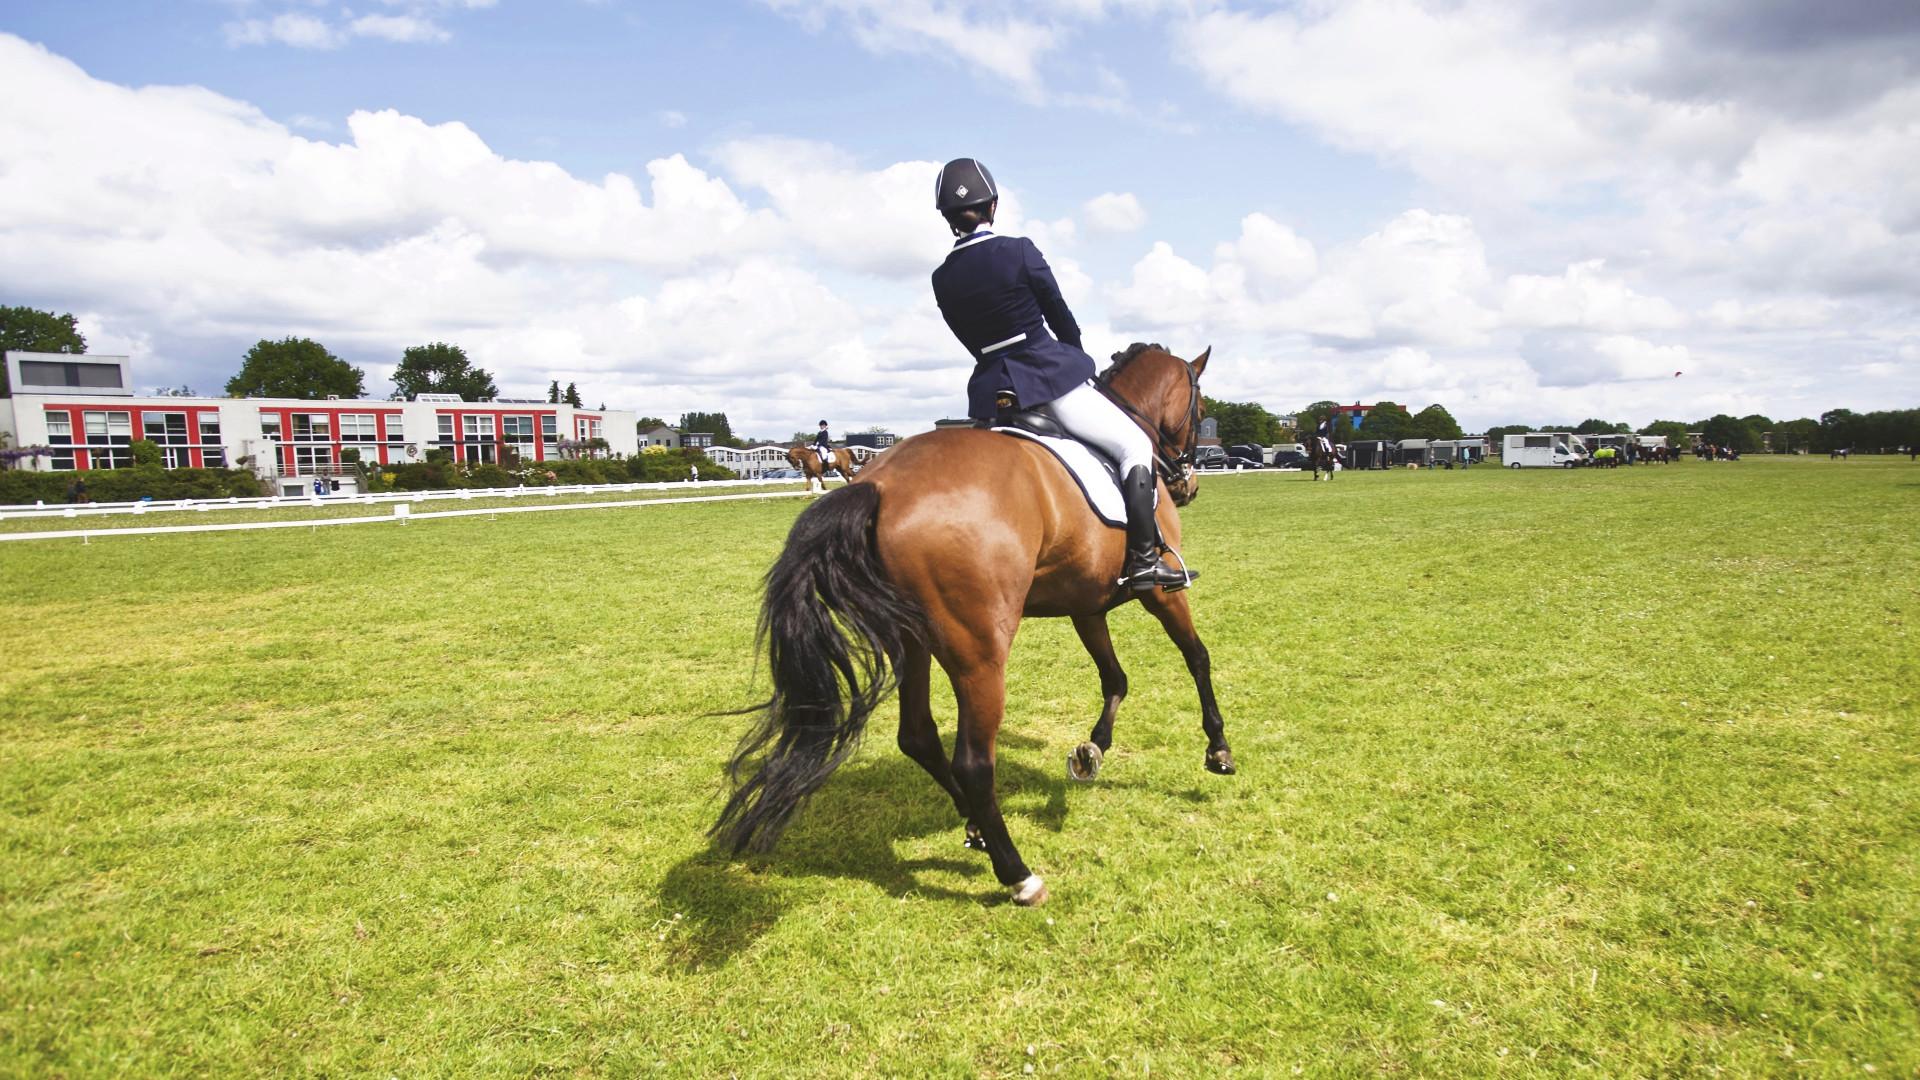 Download Wallpaper Horse Riding 1920x1080